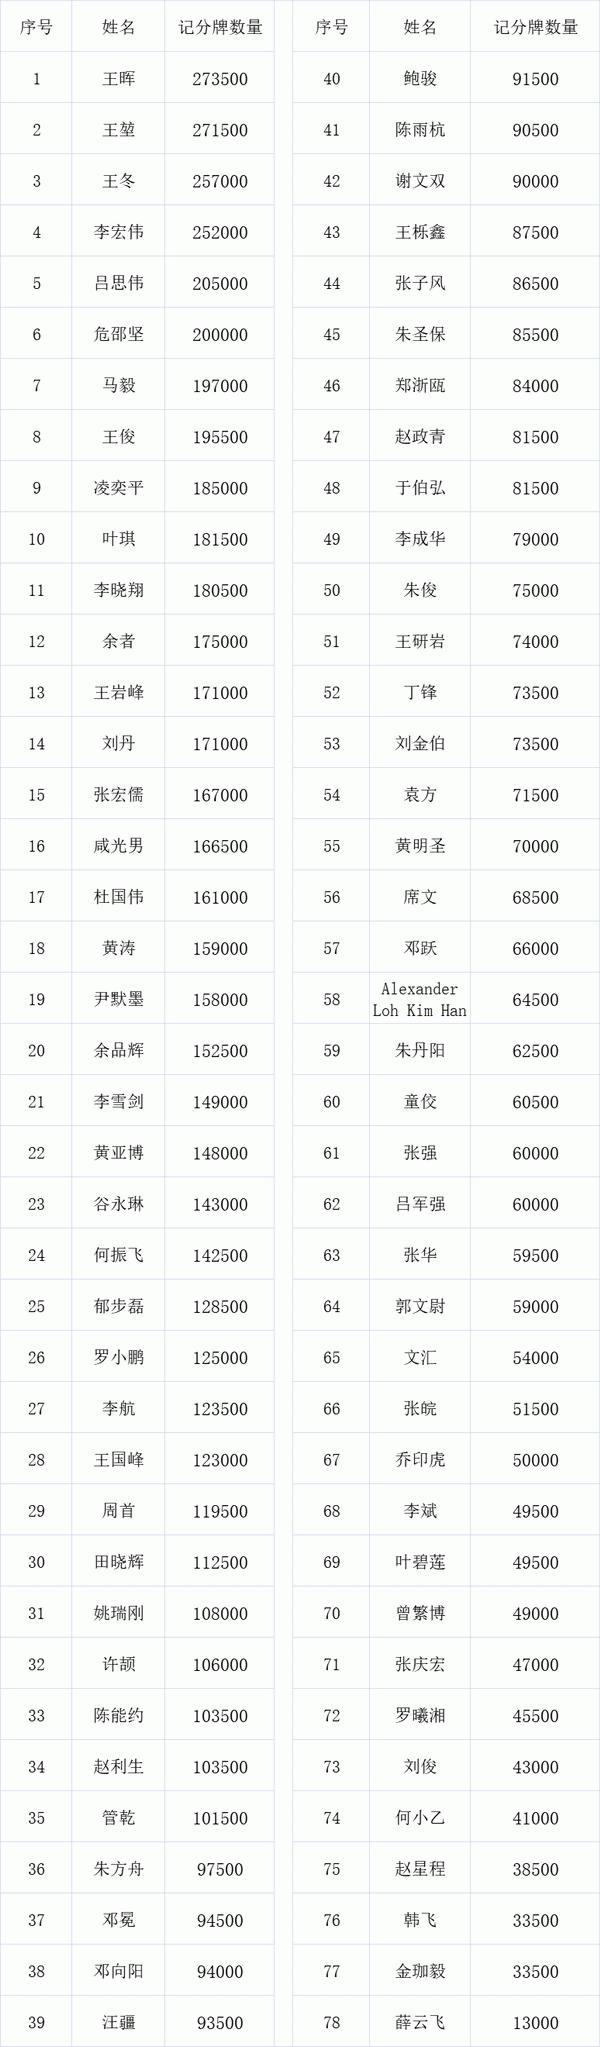 2021 TPC老虎杯 | 主赛总人数1422人,其中370位选手进入第二轮!